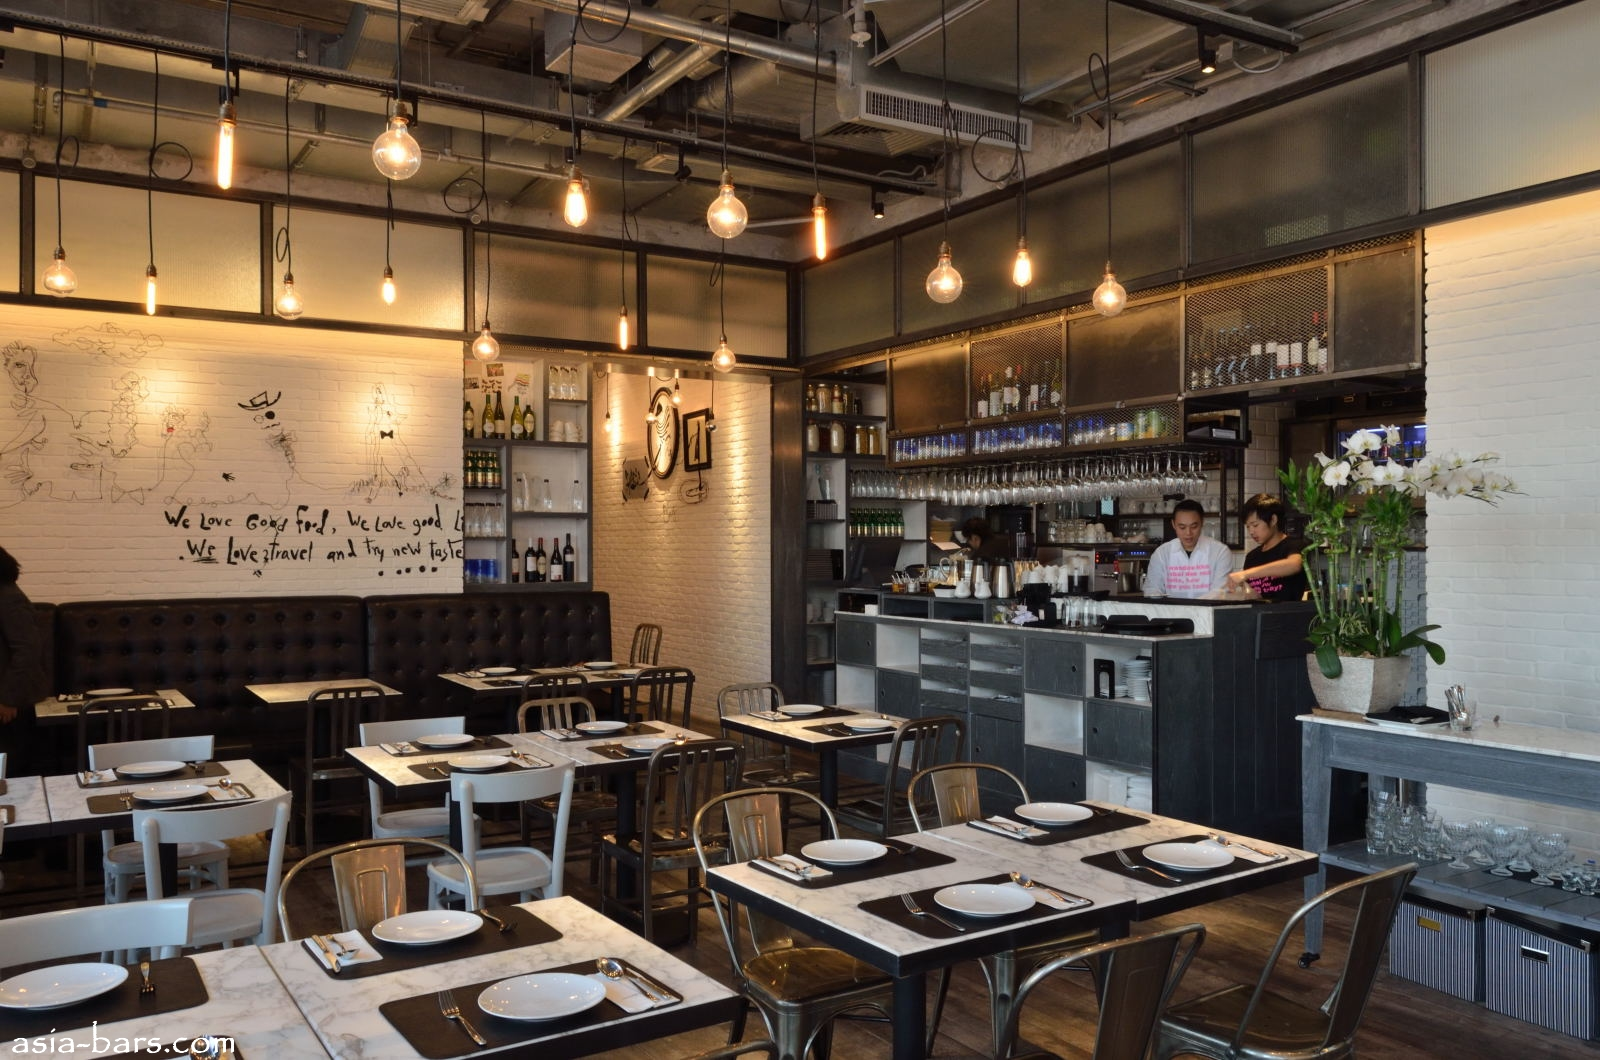 Met Cafe And Bar Menu